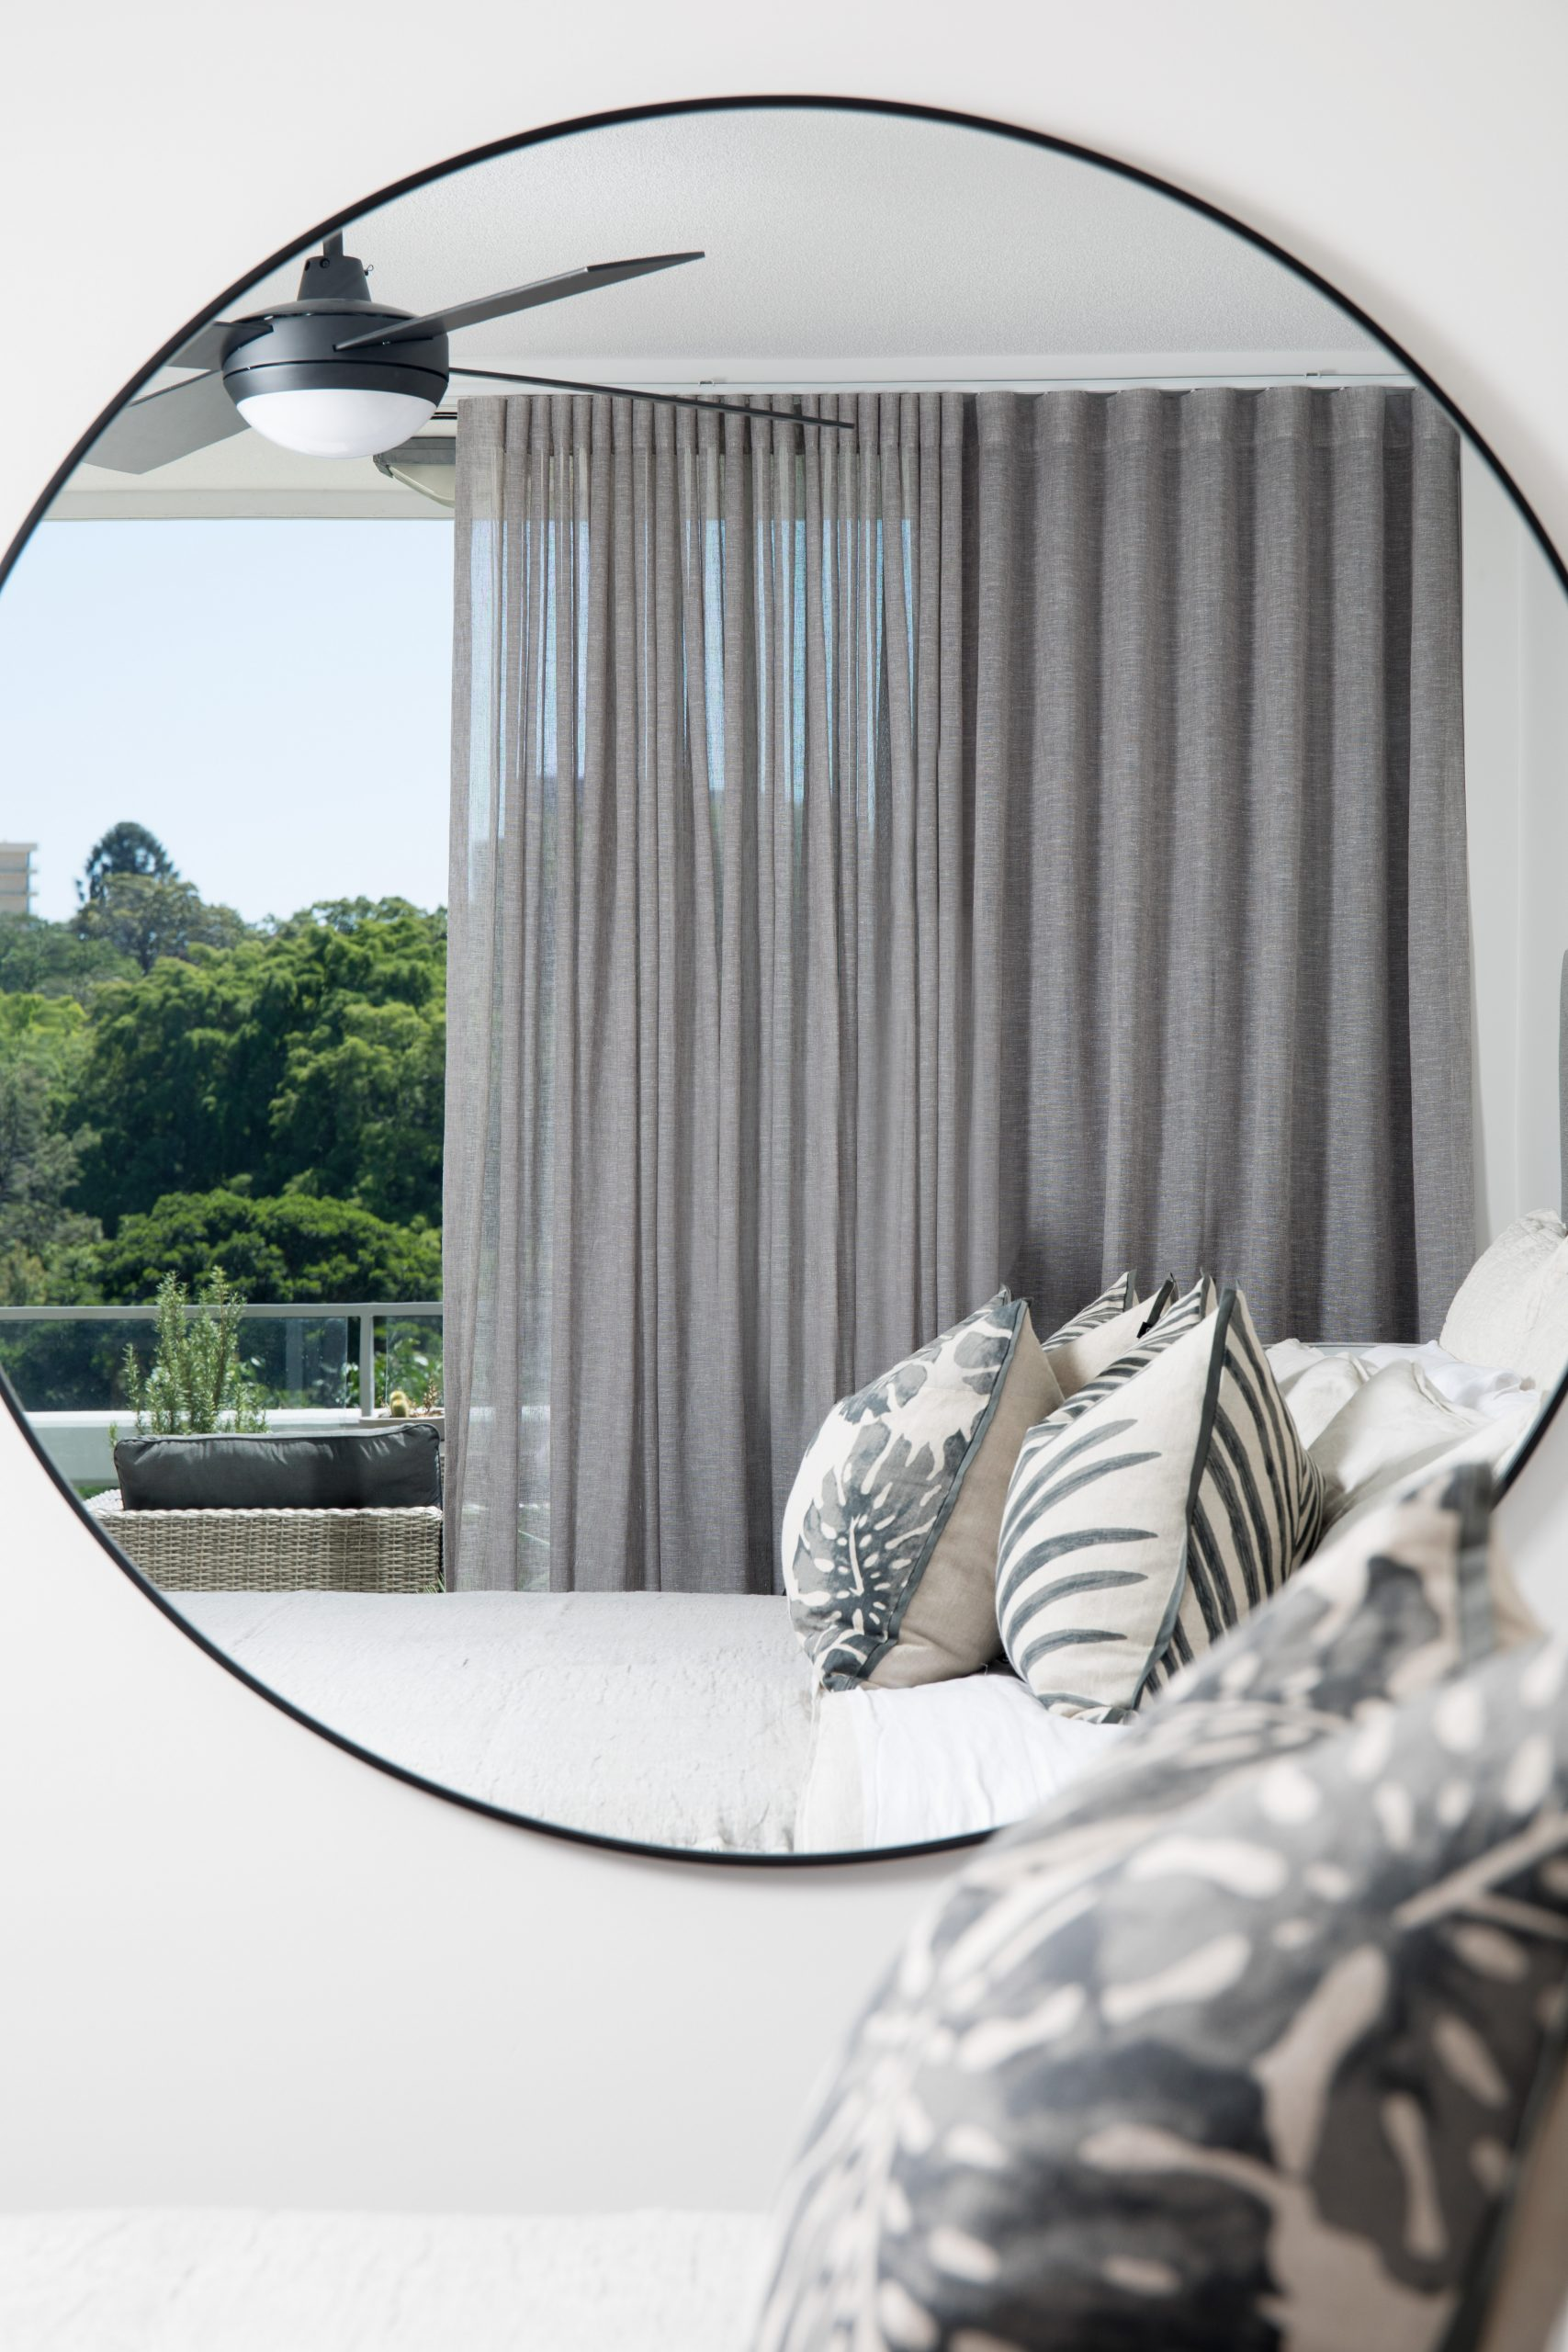 https://www.ivyandfinch.com.au/wp-content/uploads/2021/02/Roma-Street-Parklands-Interior-Design-Bedroom-scaled.jpg